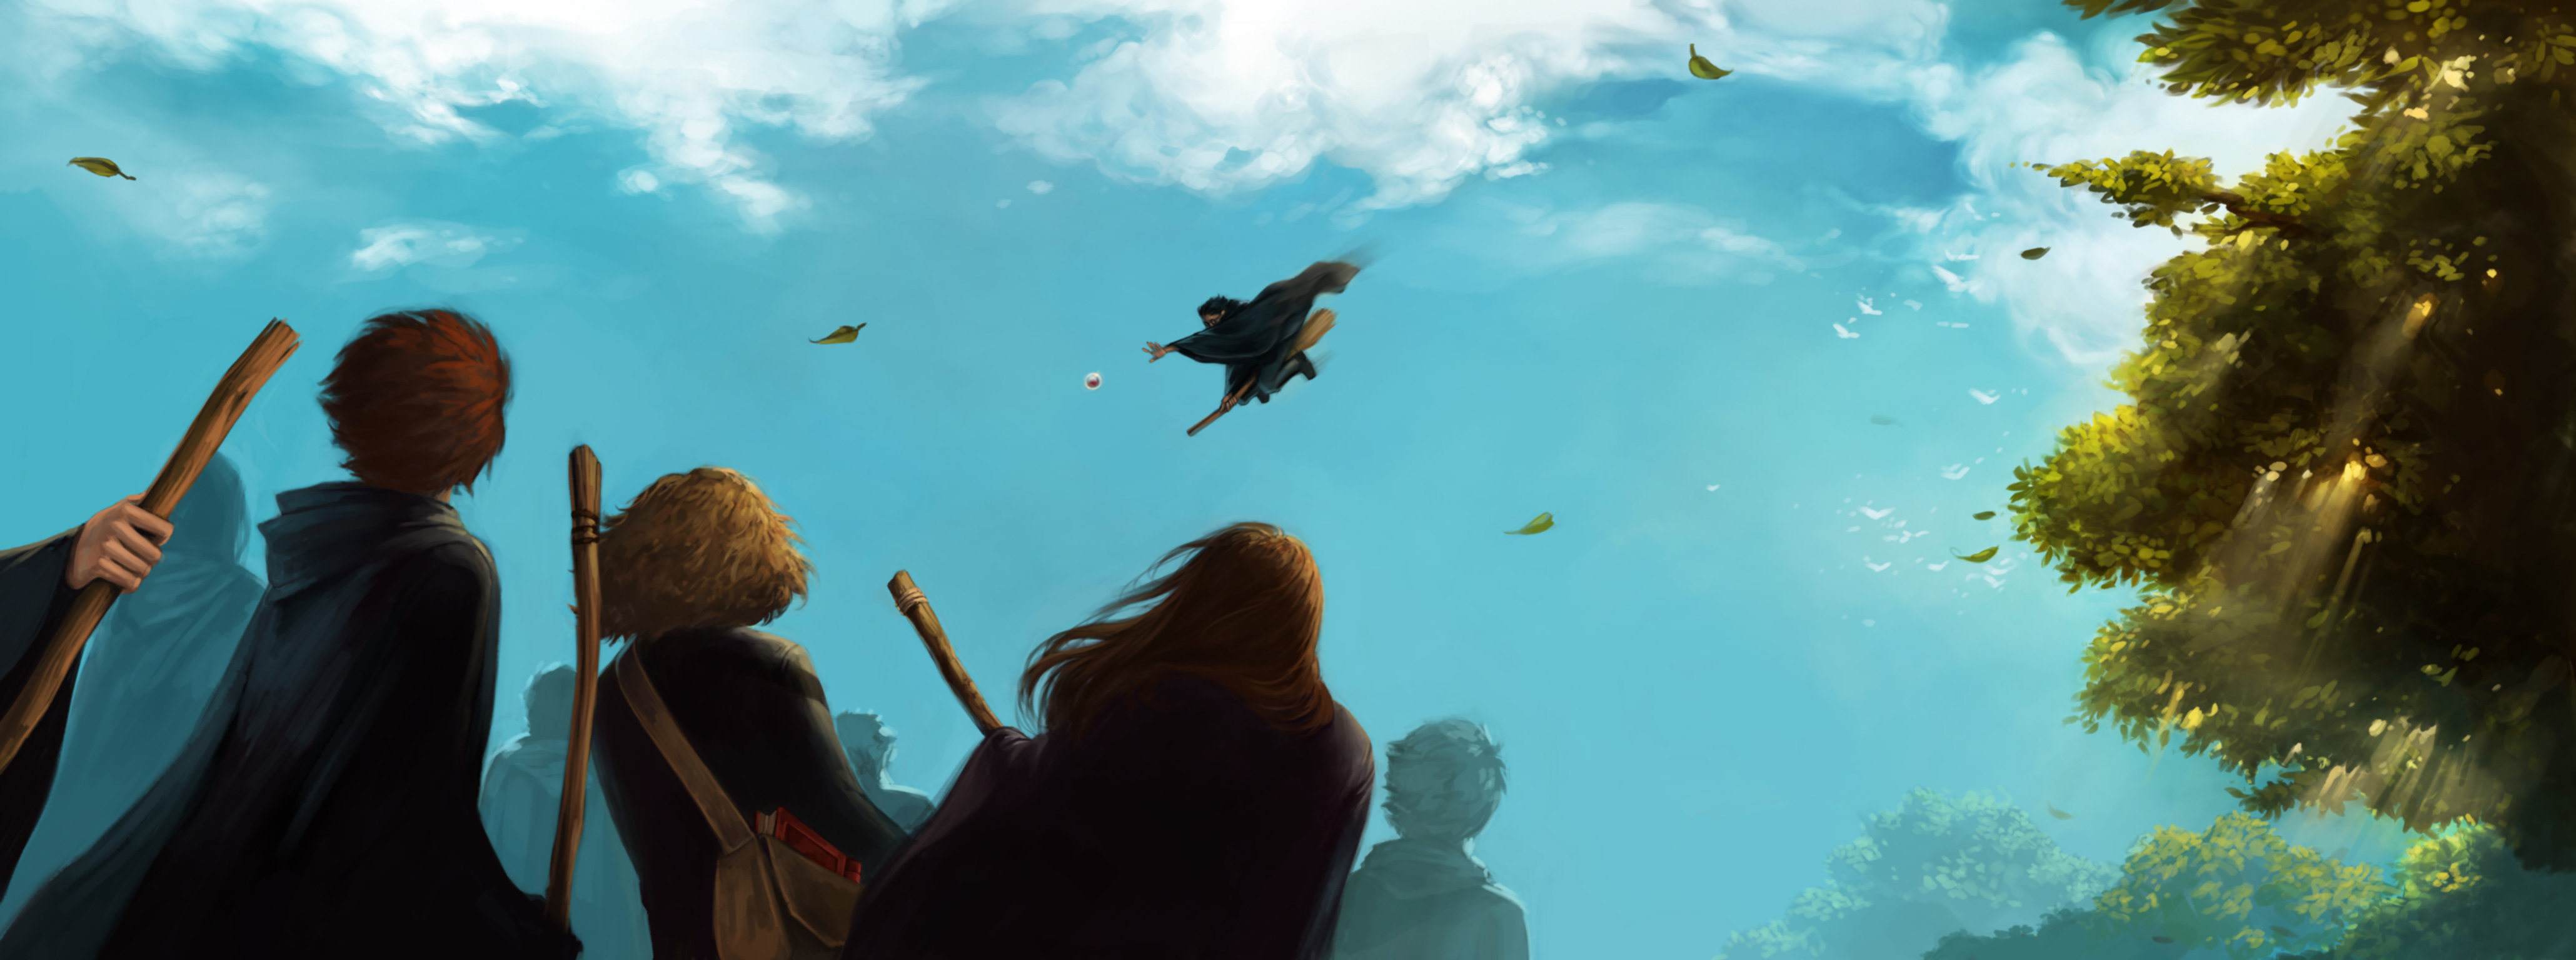 Flying (class)